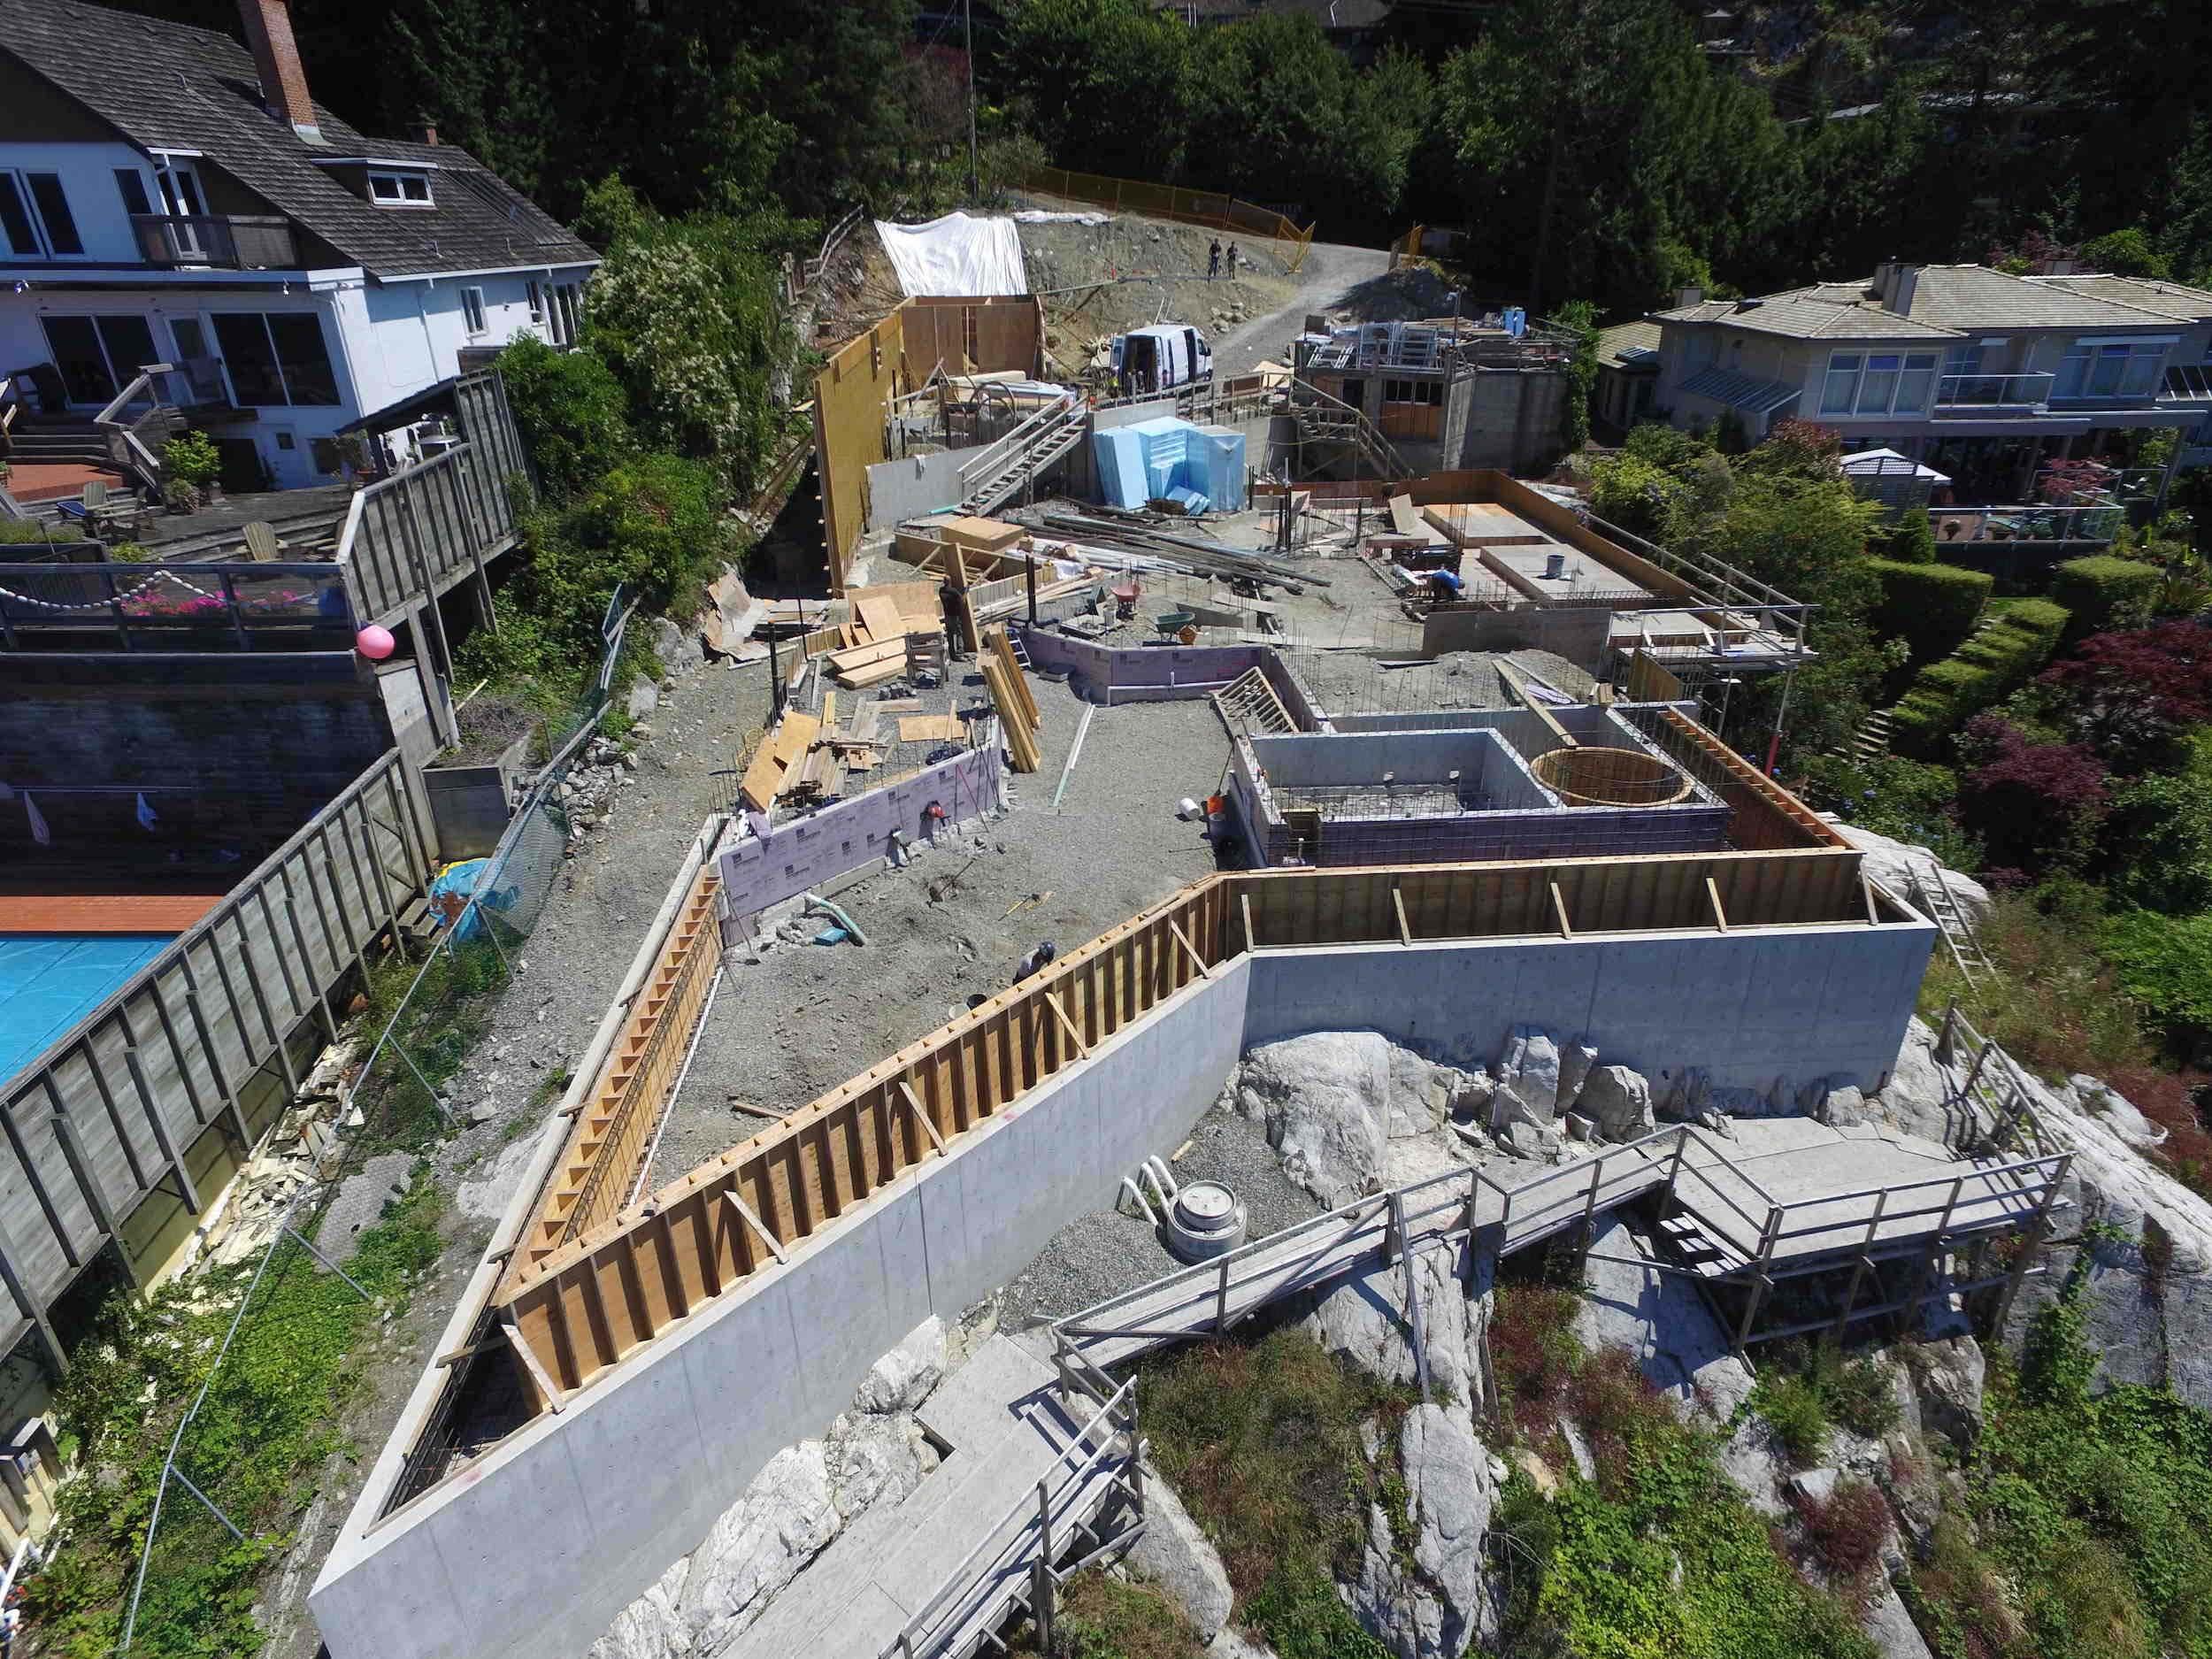 Postle_Construction_ConcreteForming1.jpg